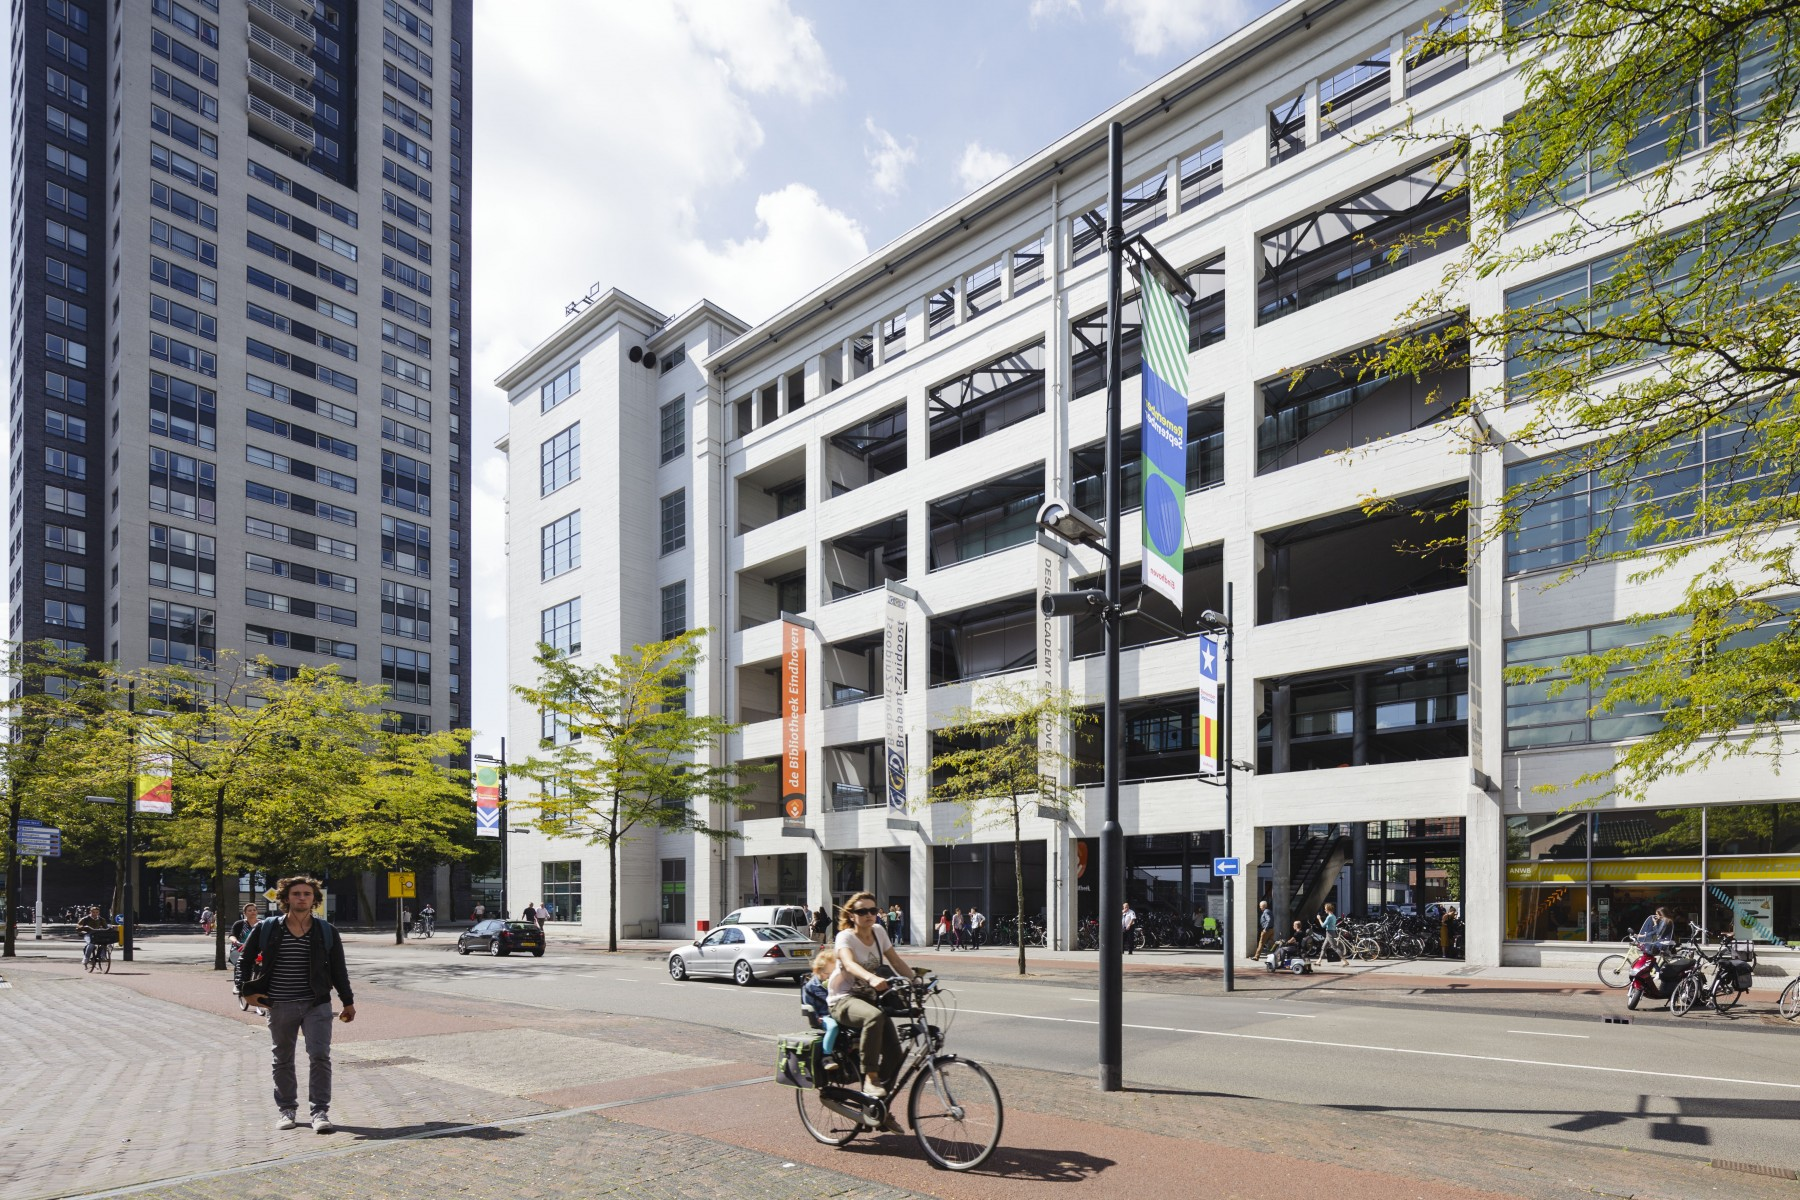 De Witte Dame in Eindhoven waar HRM & Toegepaste Psychologie is gevestigd.